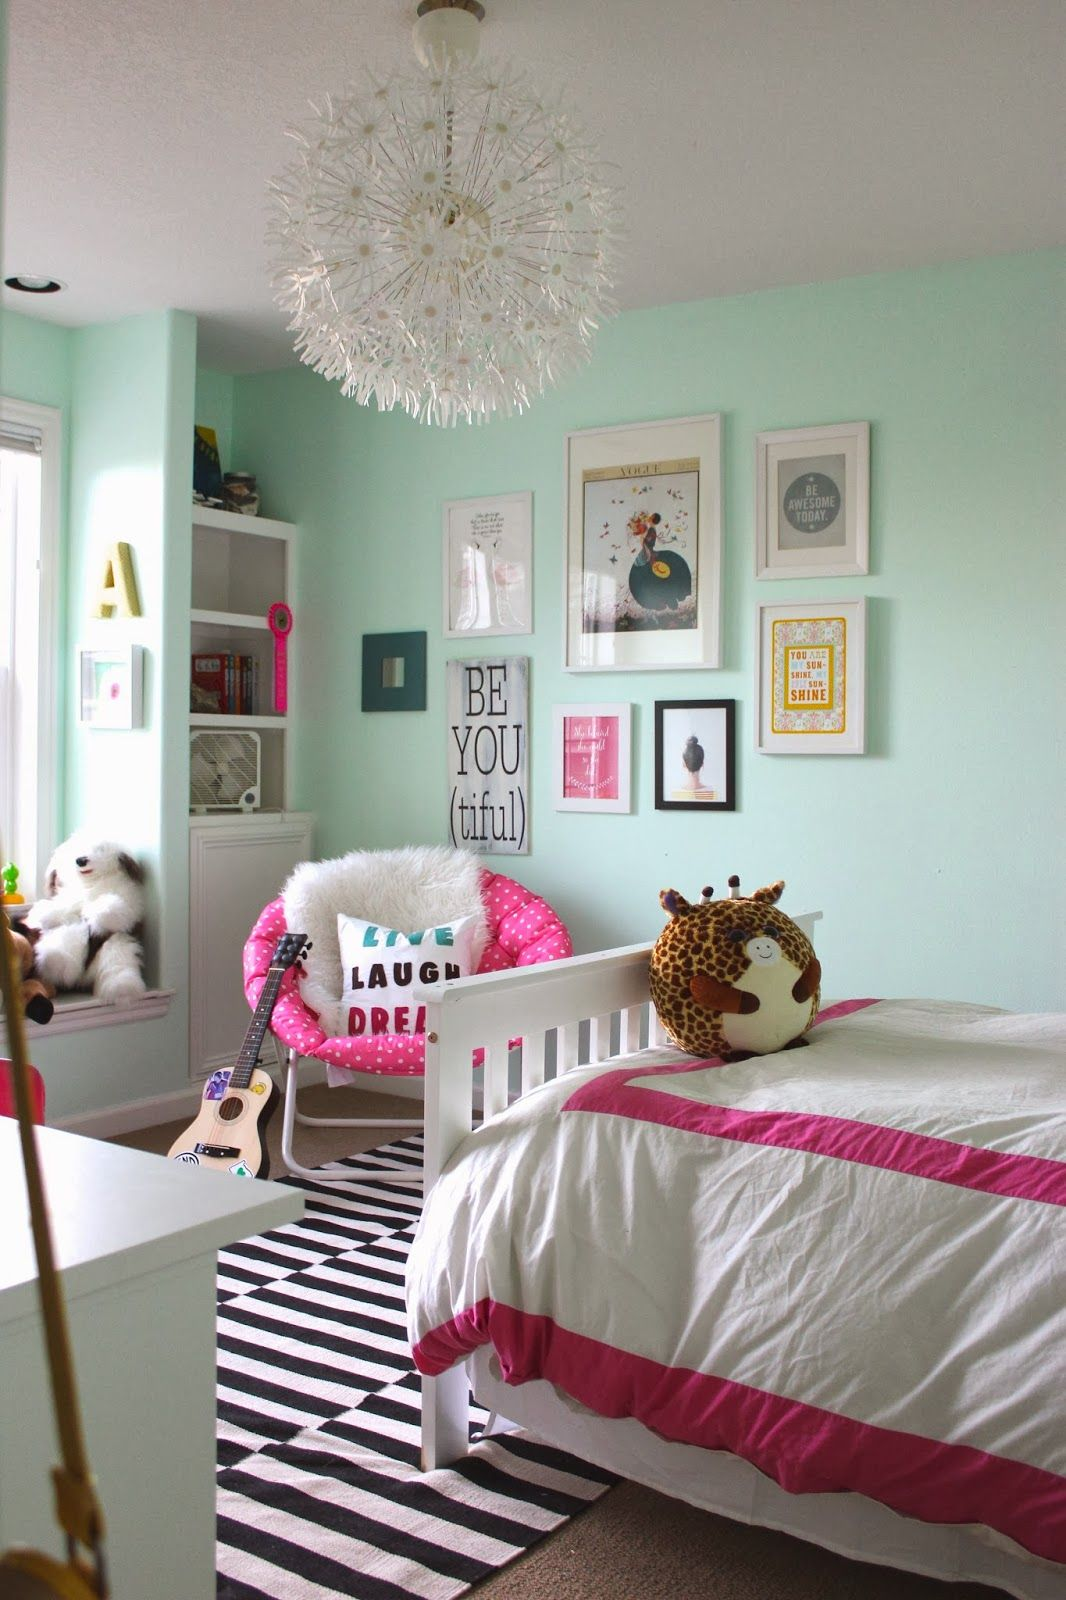 23 Stylish Teen Girl's Bedroom Ideas | Homelovr on Teenage Rooms  id=81894